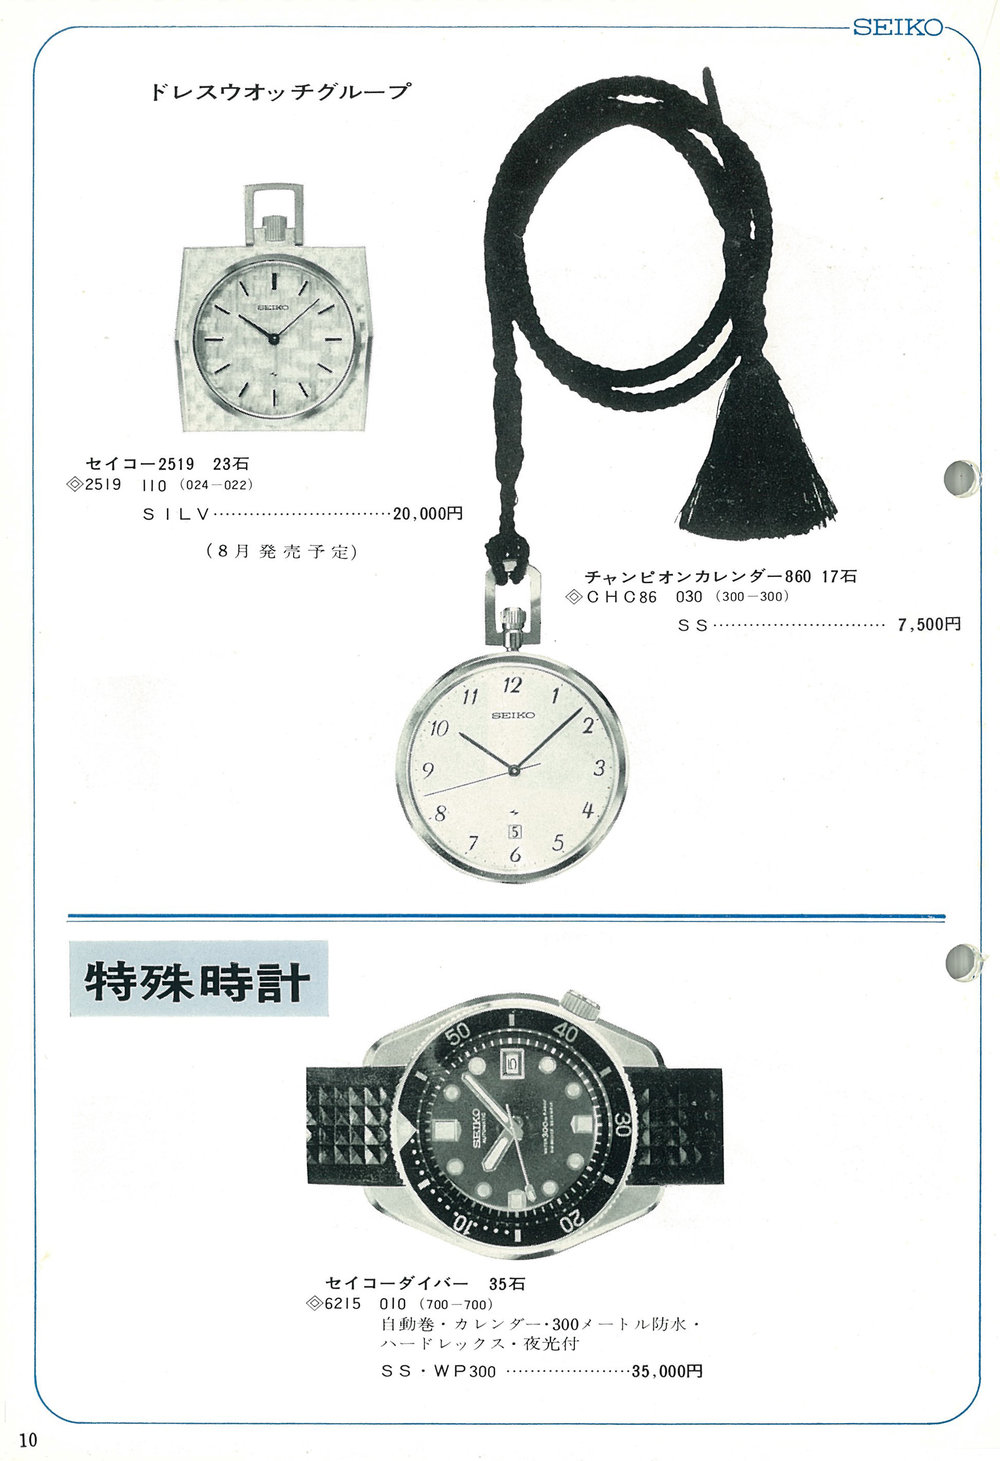 1967 Catalog Supplement 6215-7000